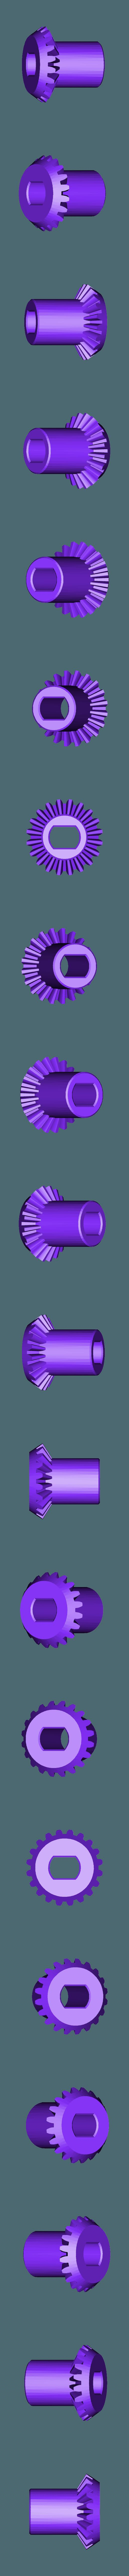 Truck_V4_Axle_Diff_Gear1.STL Download STL file 3D Printed Rc Truck V4 • 3D printable template, MrCrankyface